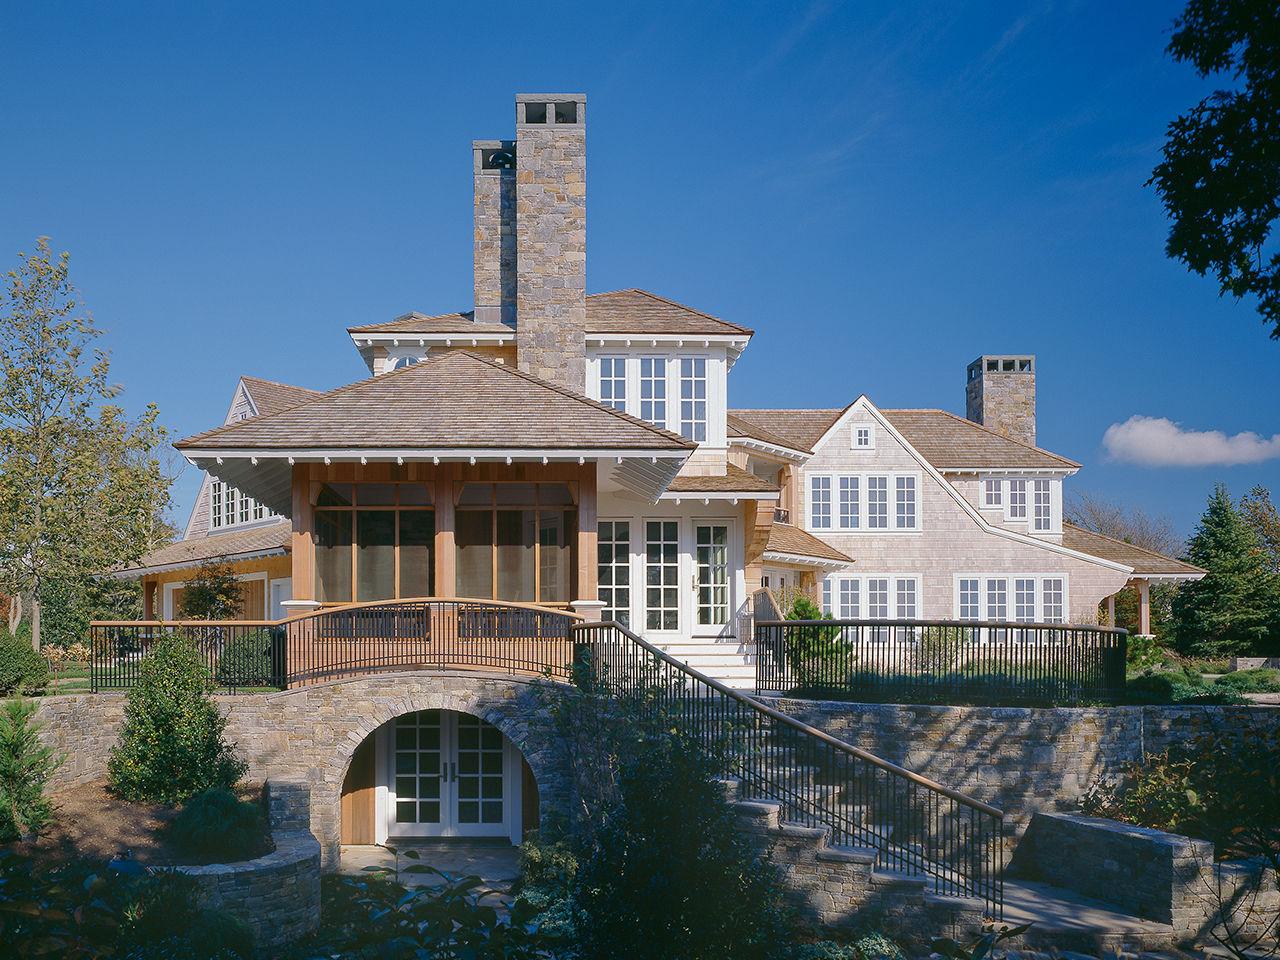 House Tour-Champagne Bluff is A Dream Summer House 3.jpg